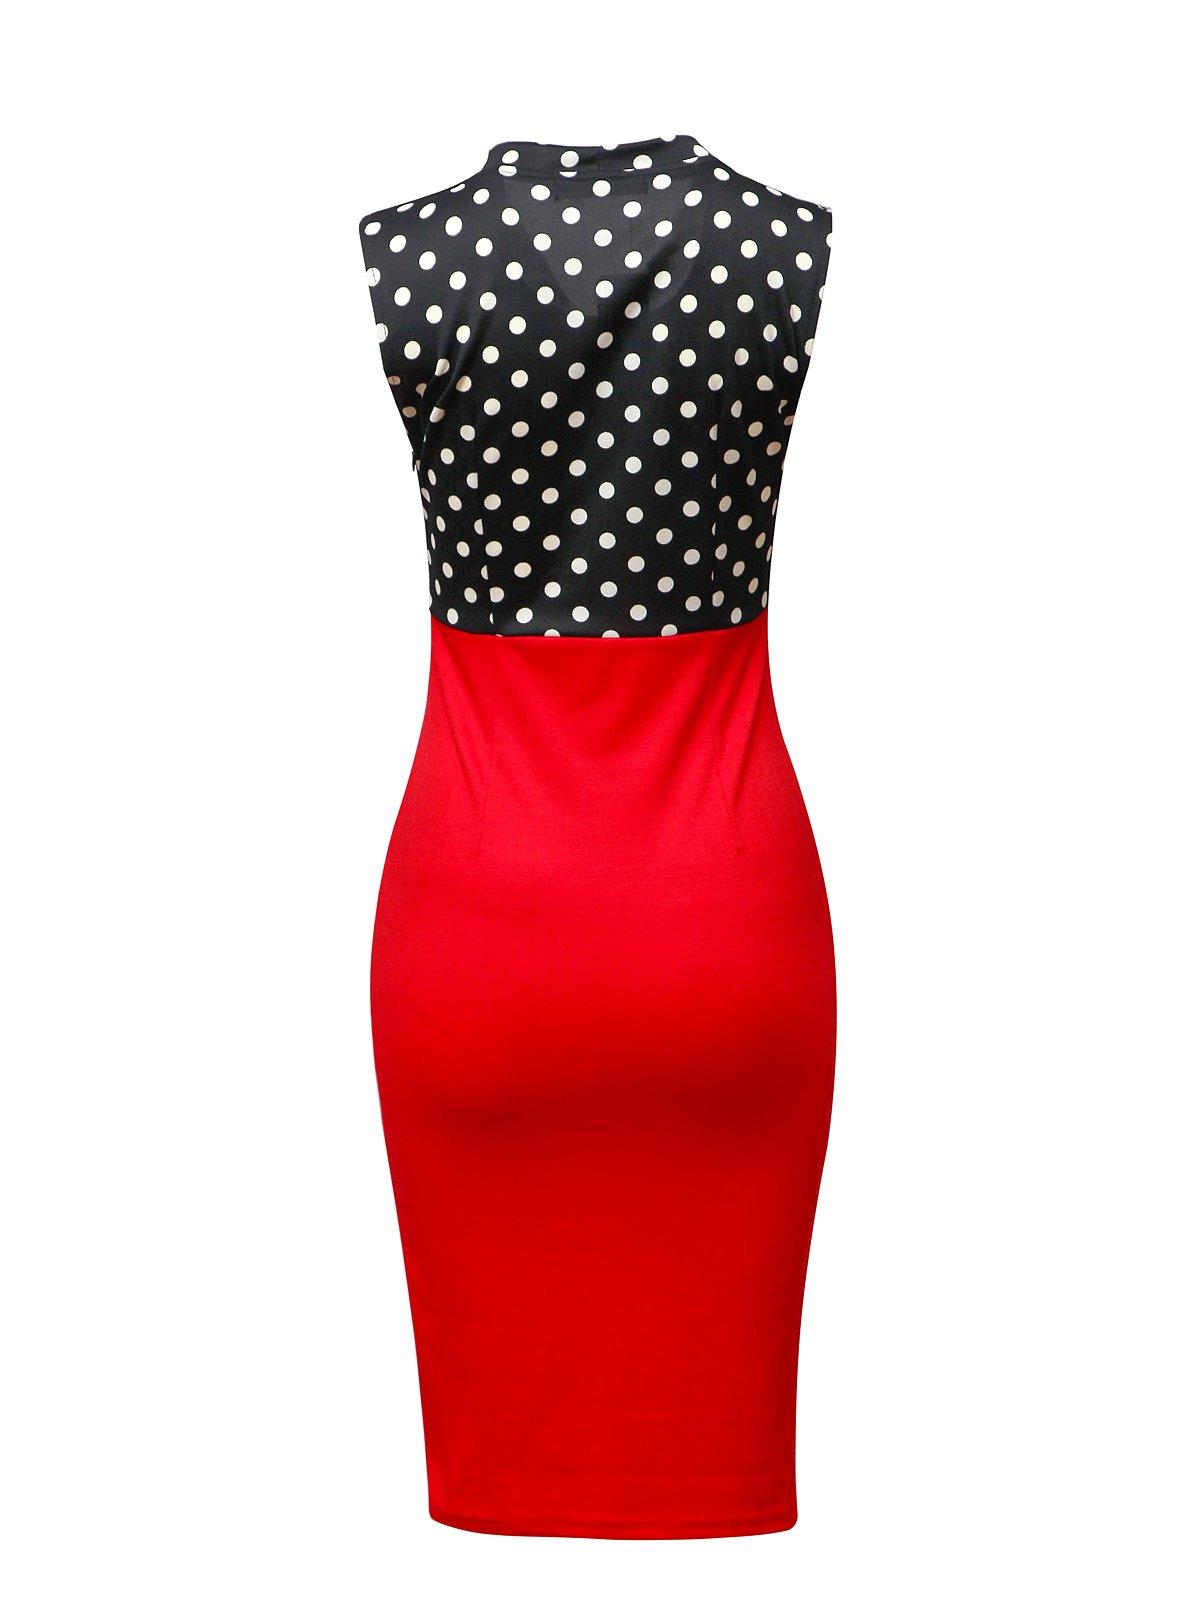 CISMARK Elegant Color block V-Neck Sleeveless Office Pencil Dress Red M by CISMARK (Image #2)